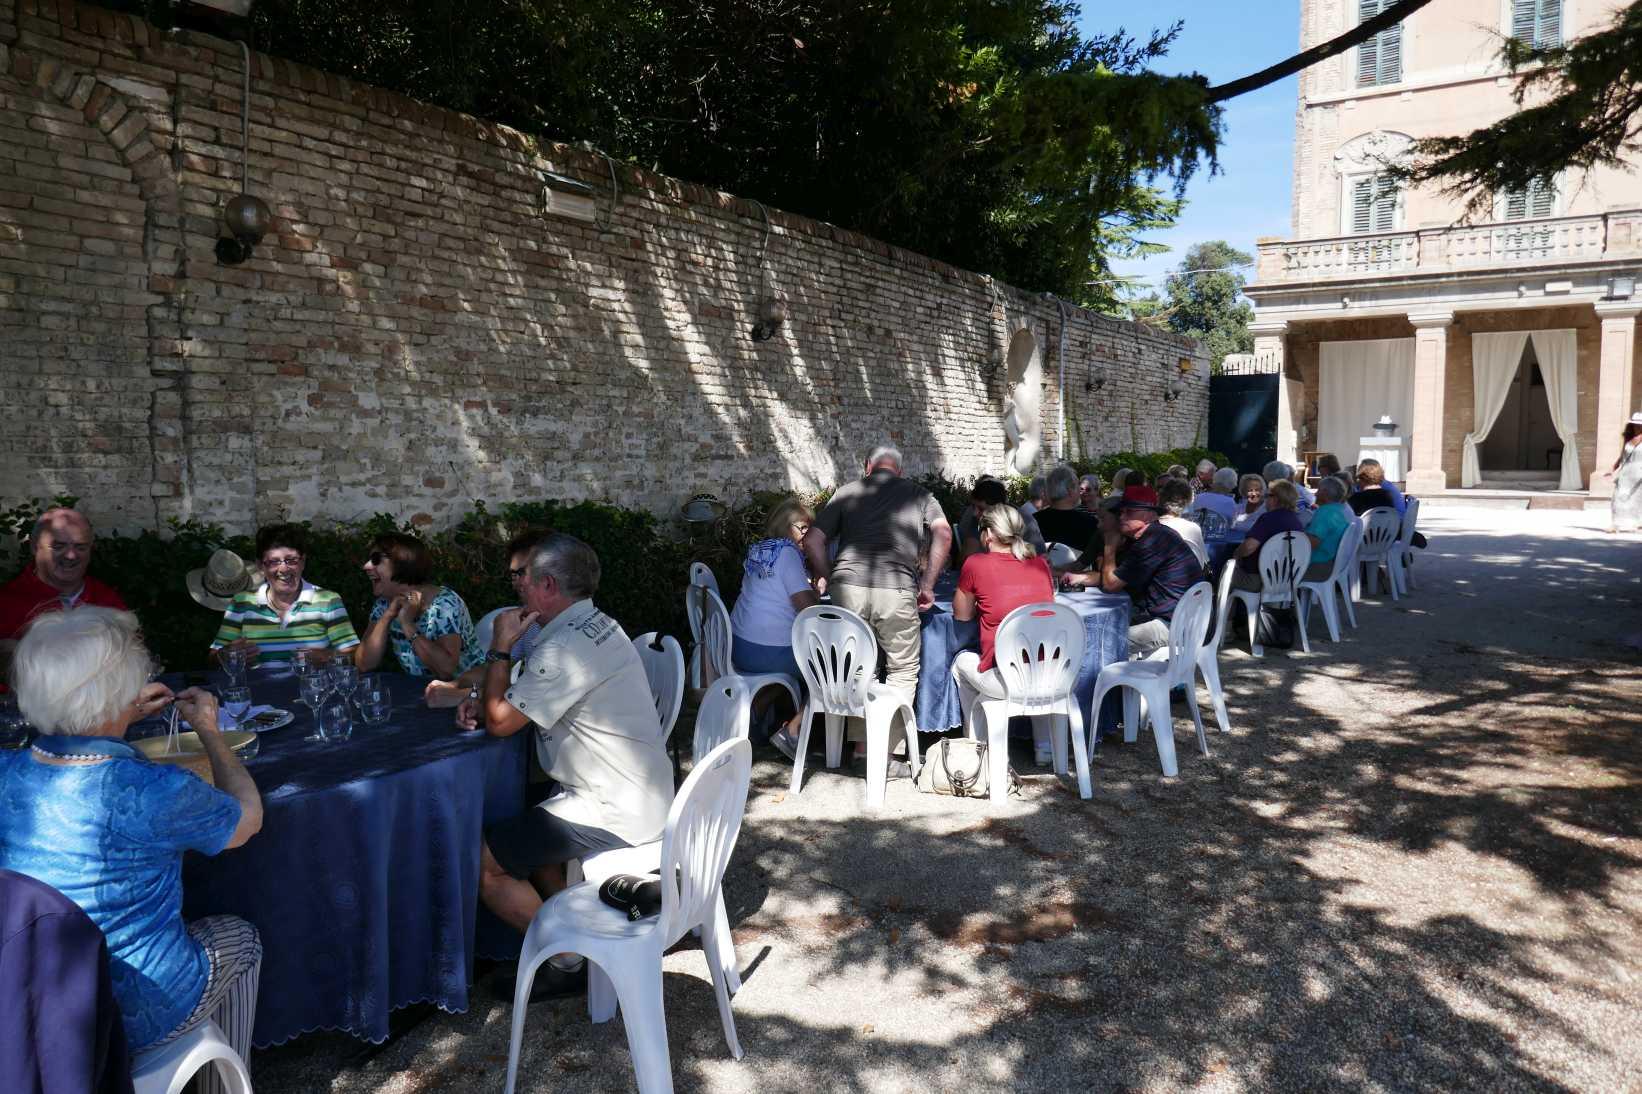 Mittagsbuffet im Park der Villa Buonaccorsi